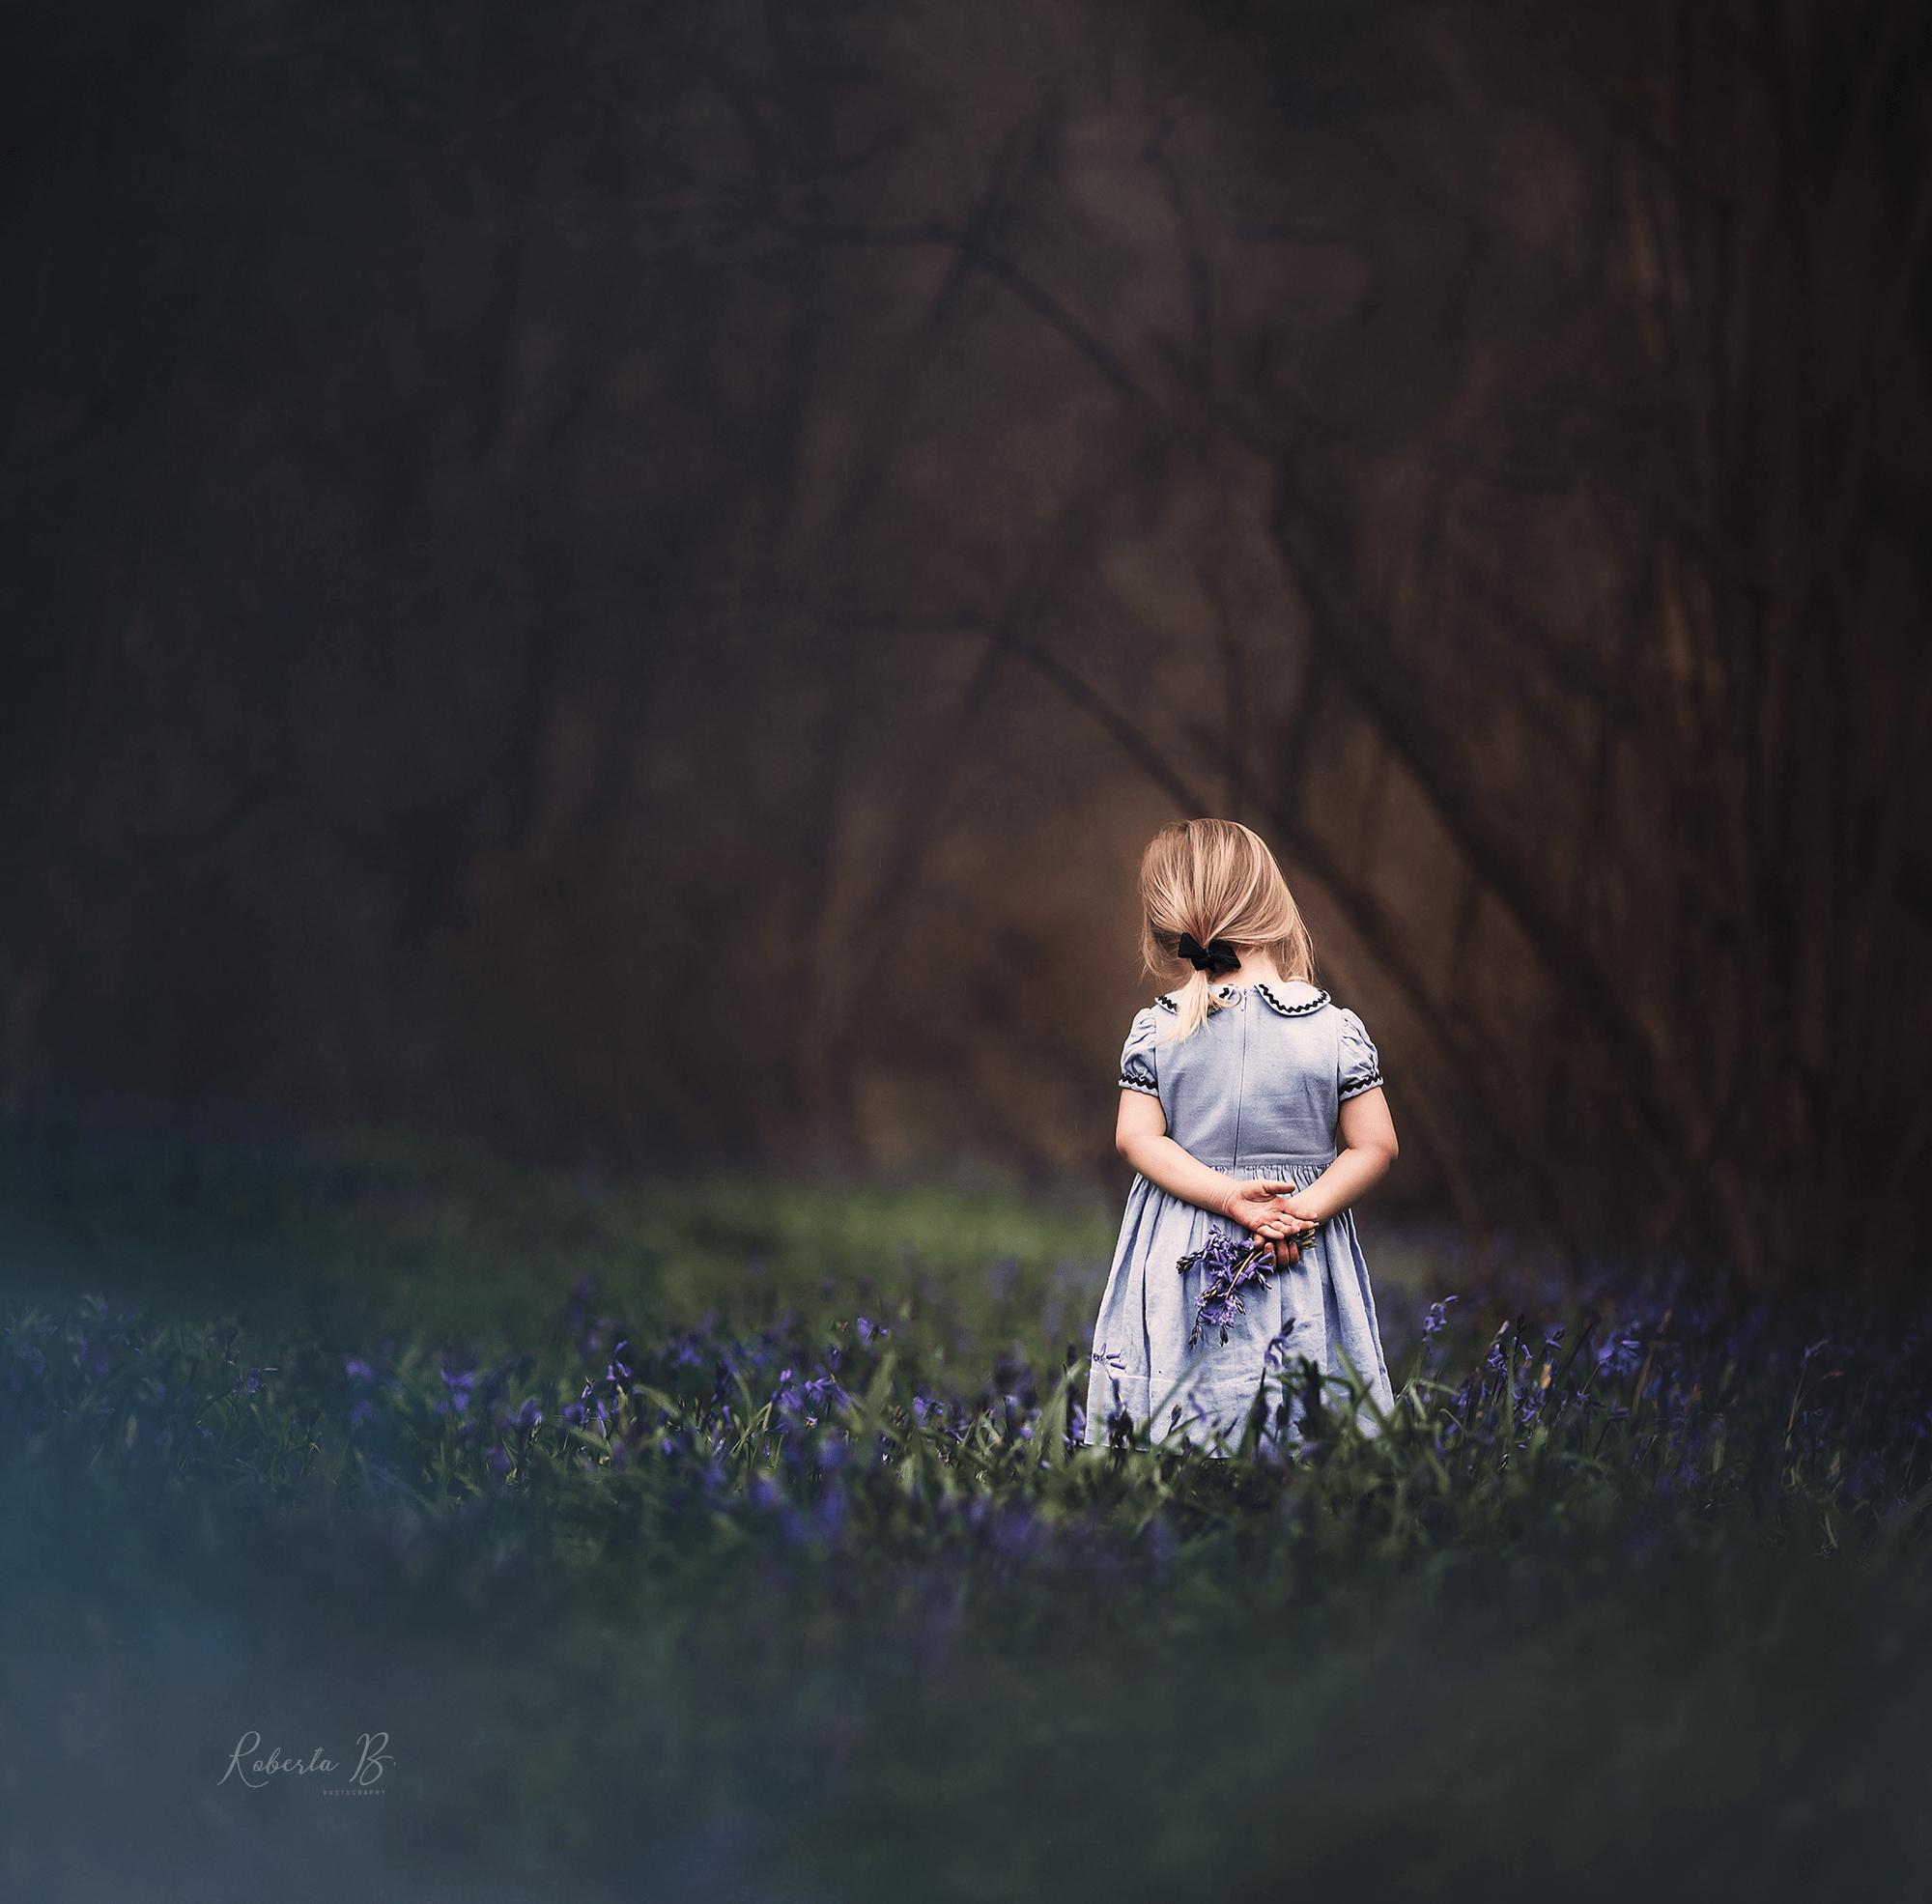 Roberta B Photography